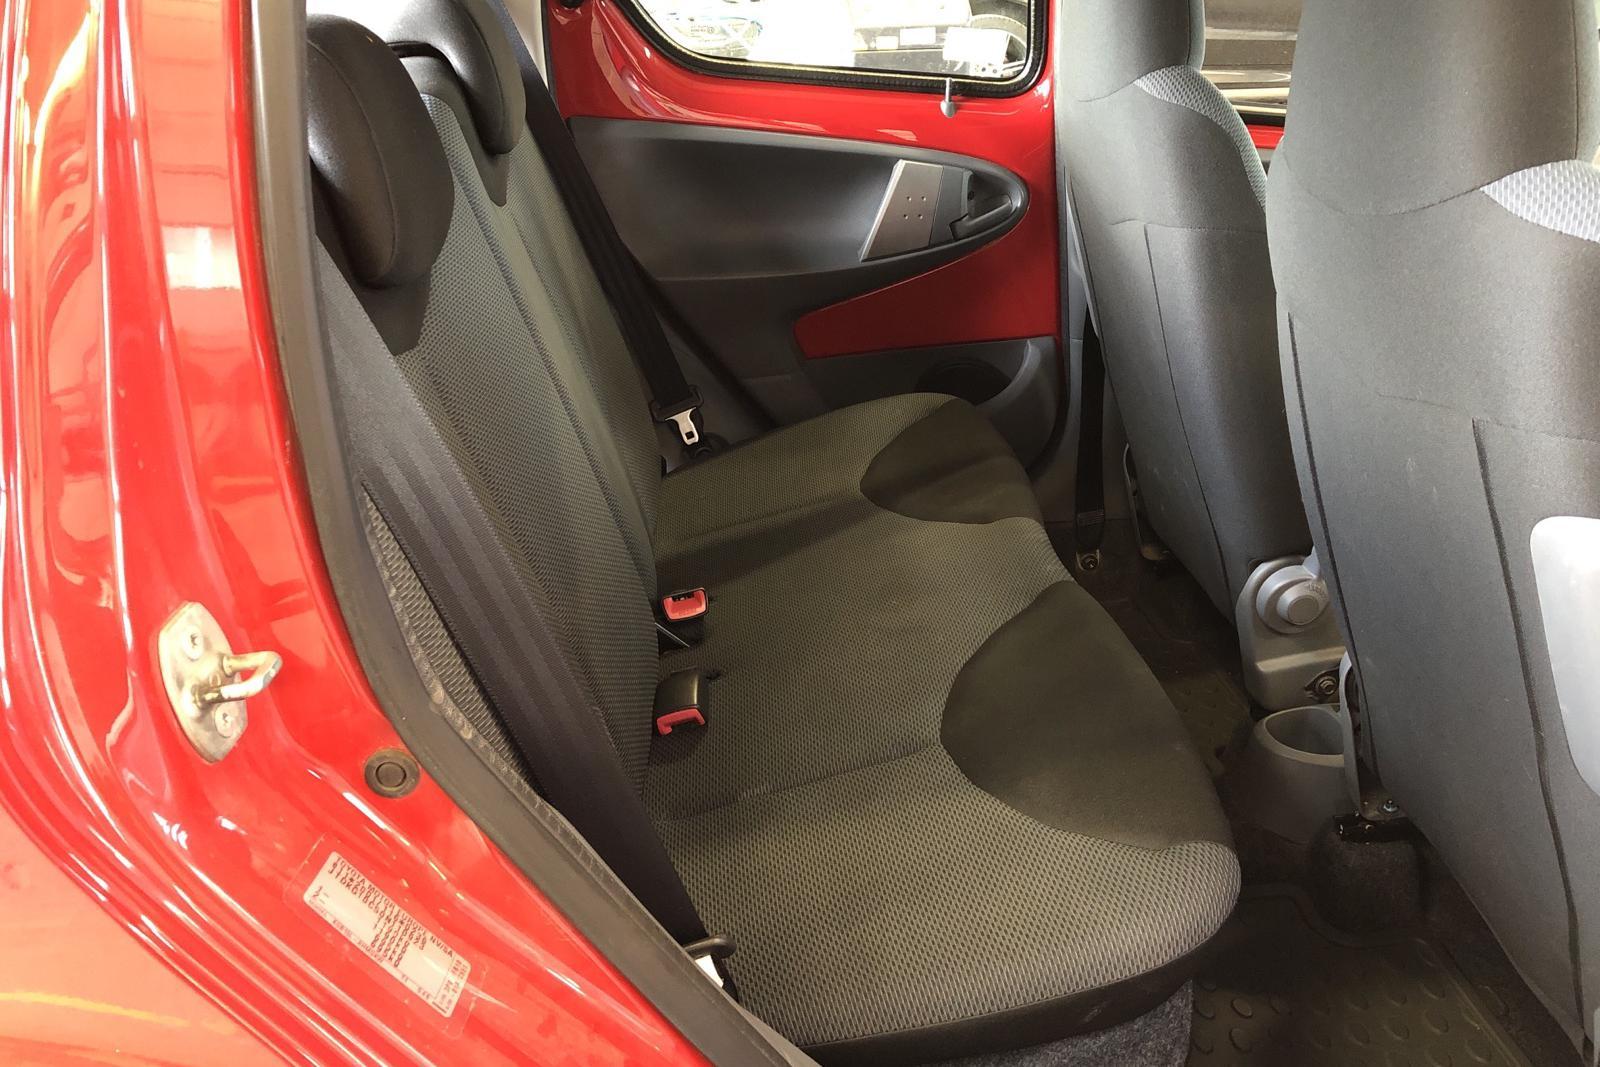 Toyota Aygo 1.0 VVT-i 5dr (68hk) - 102 150 km - Manual - red - 2007